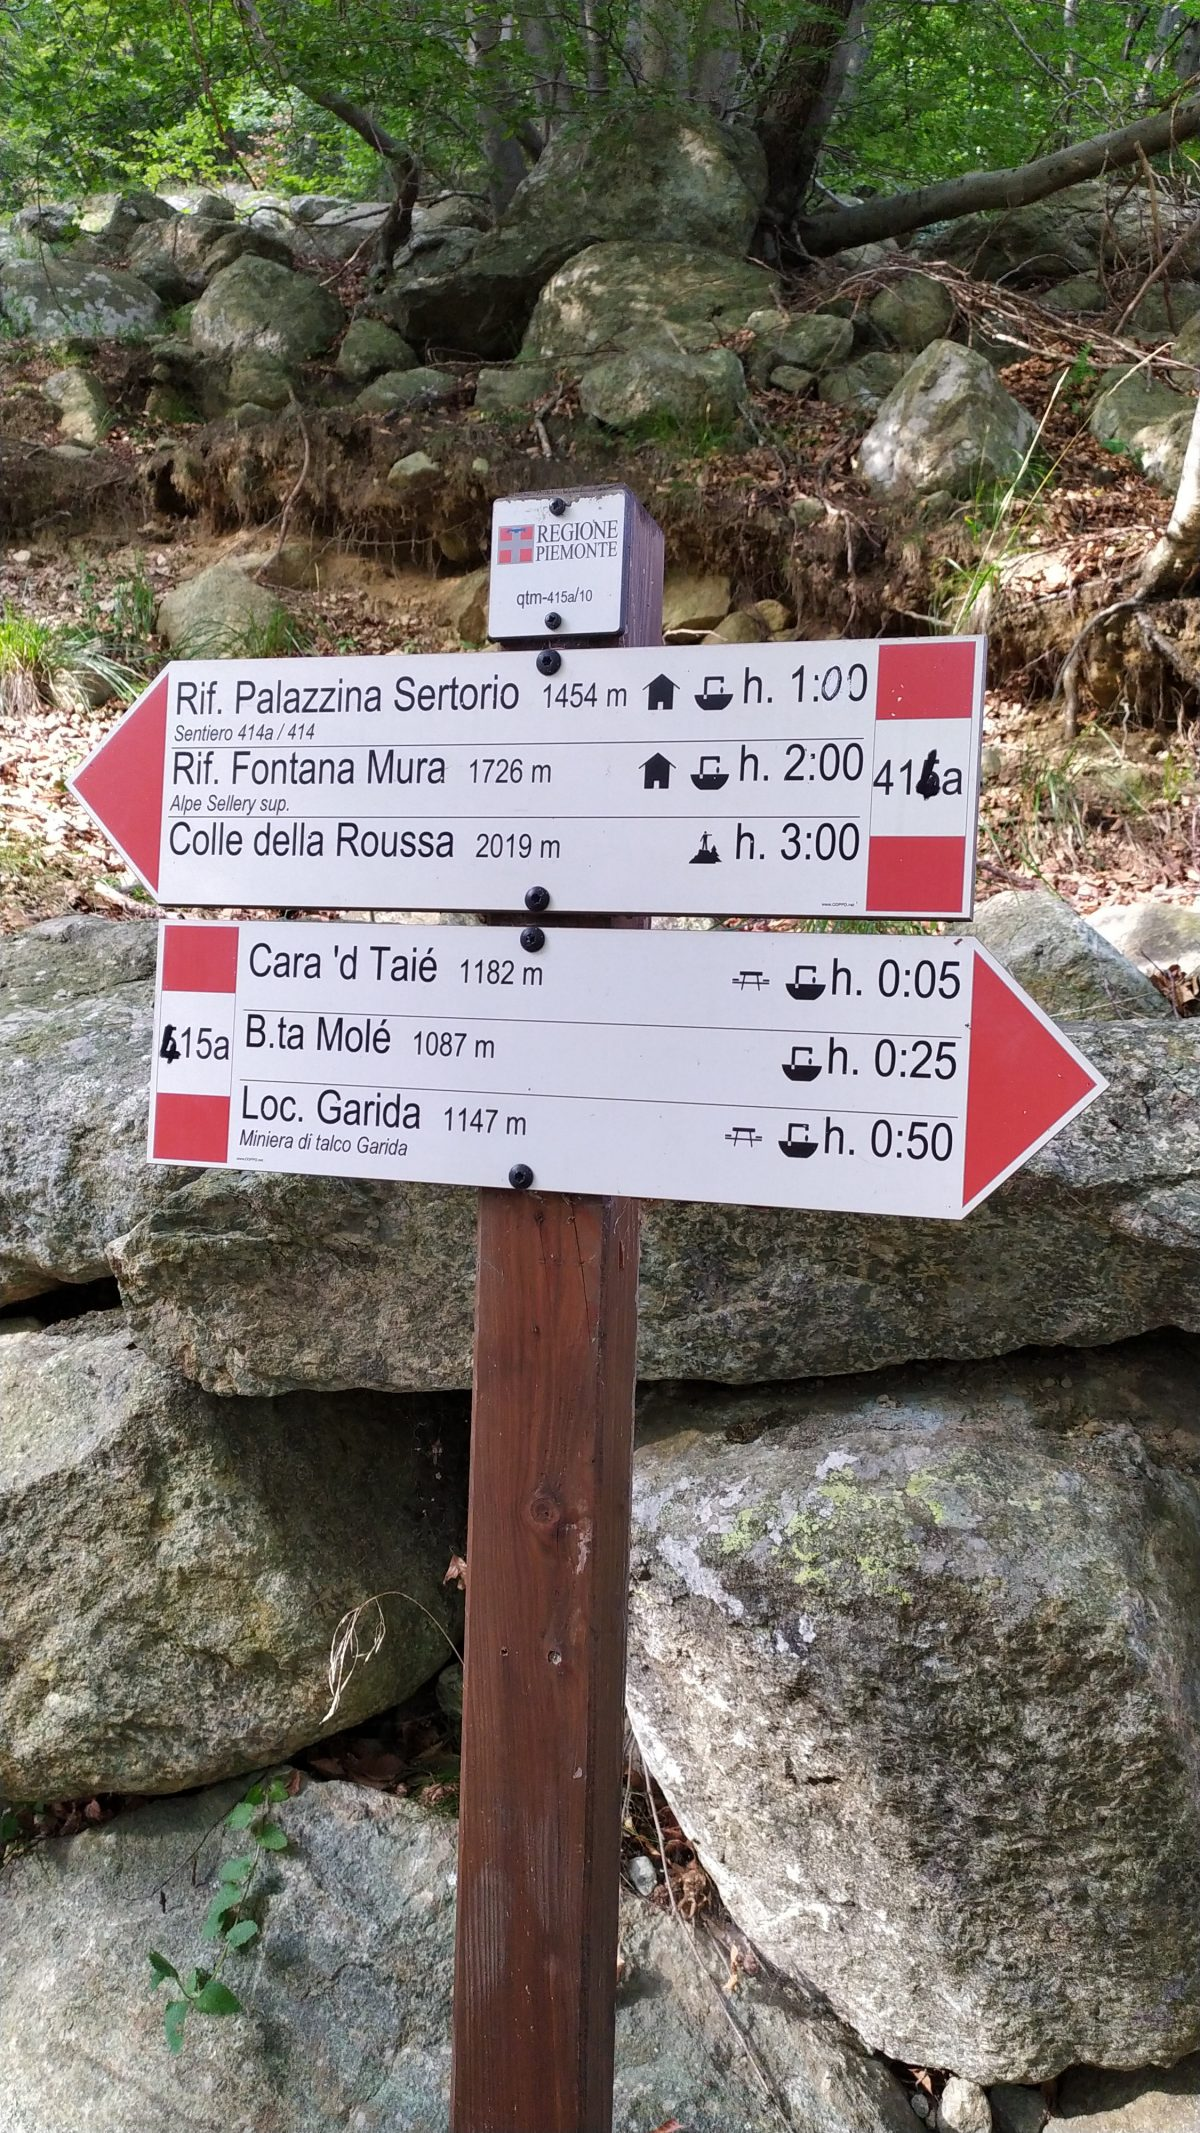 Rifugio Fontana Mura - Indicazioni